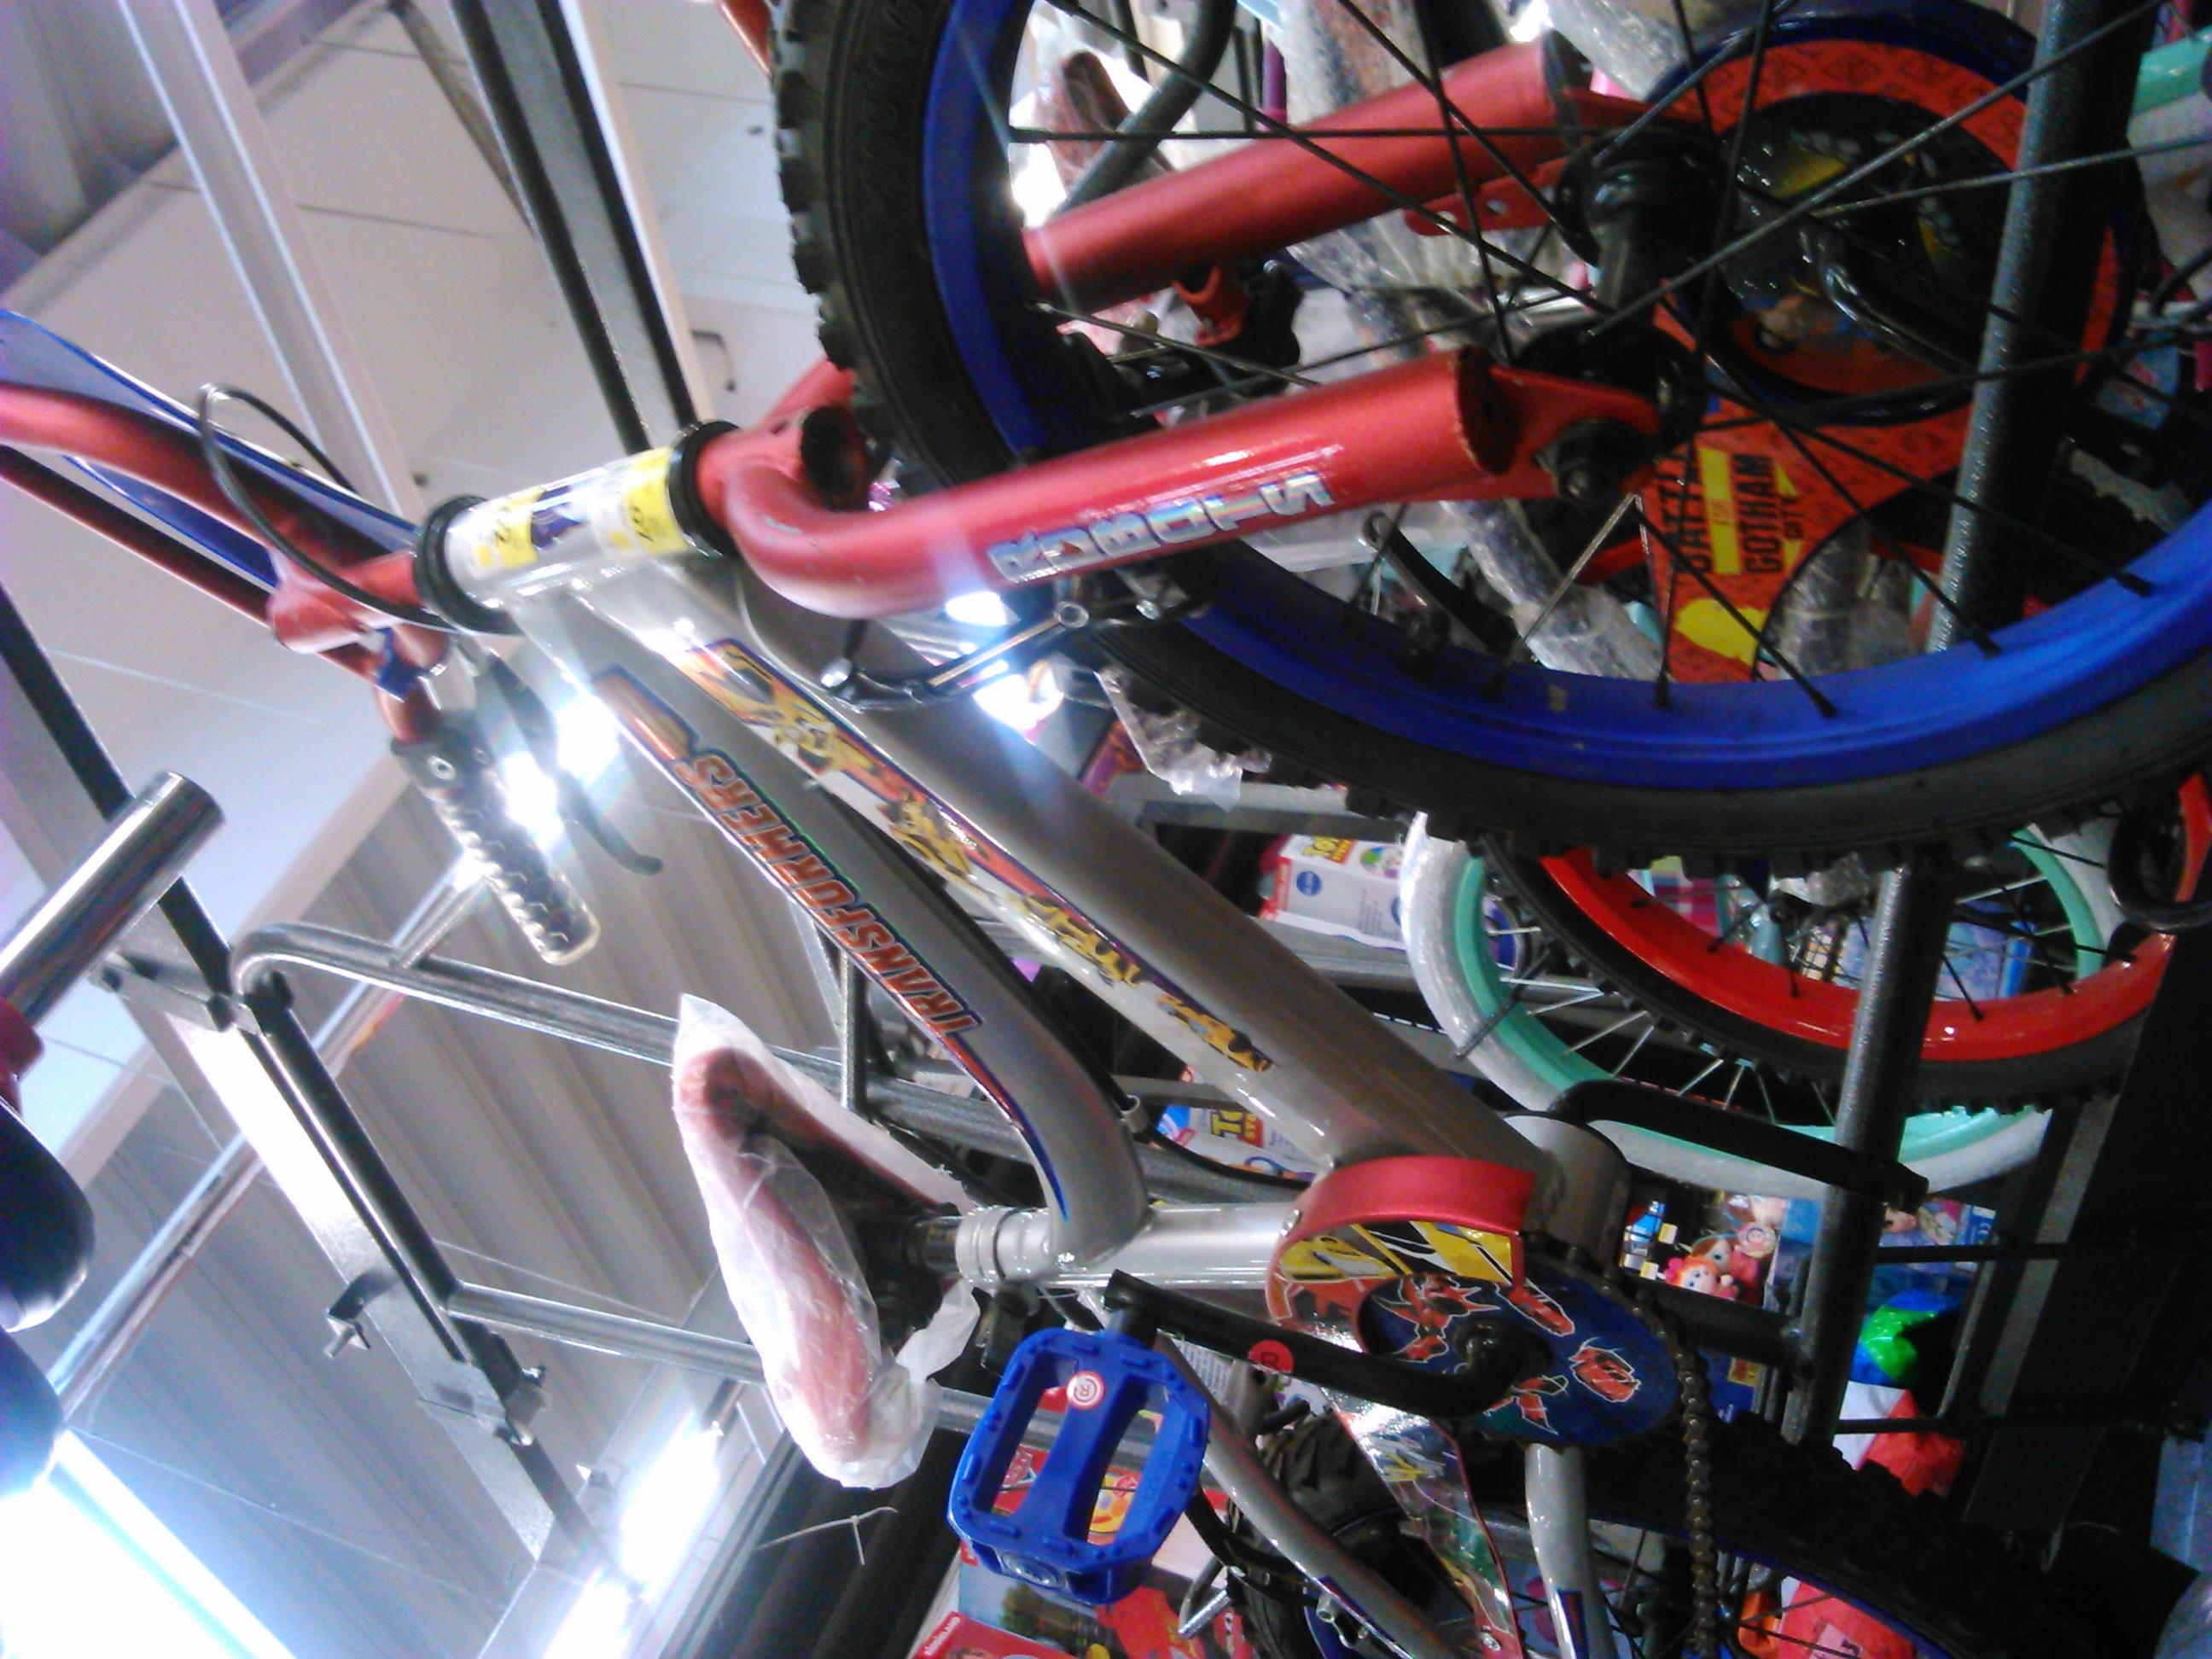 Walmart Villa Coapa: bicicleta R16 Transformers a $960.02